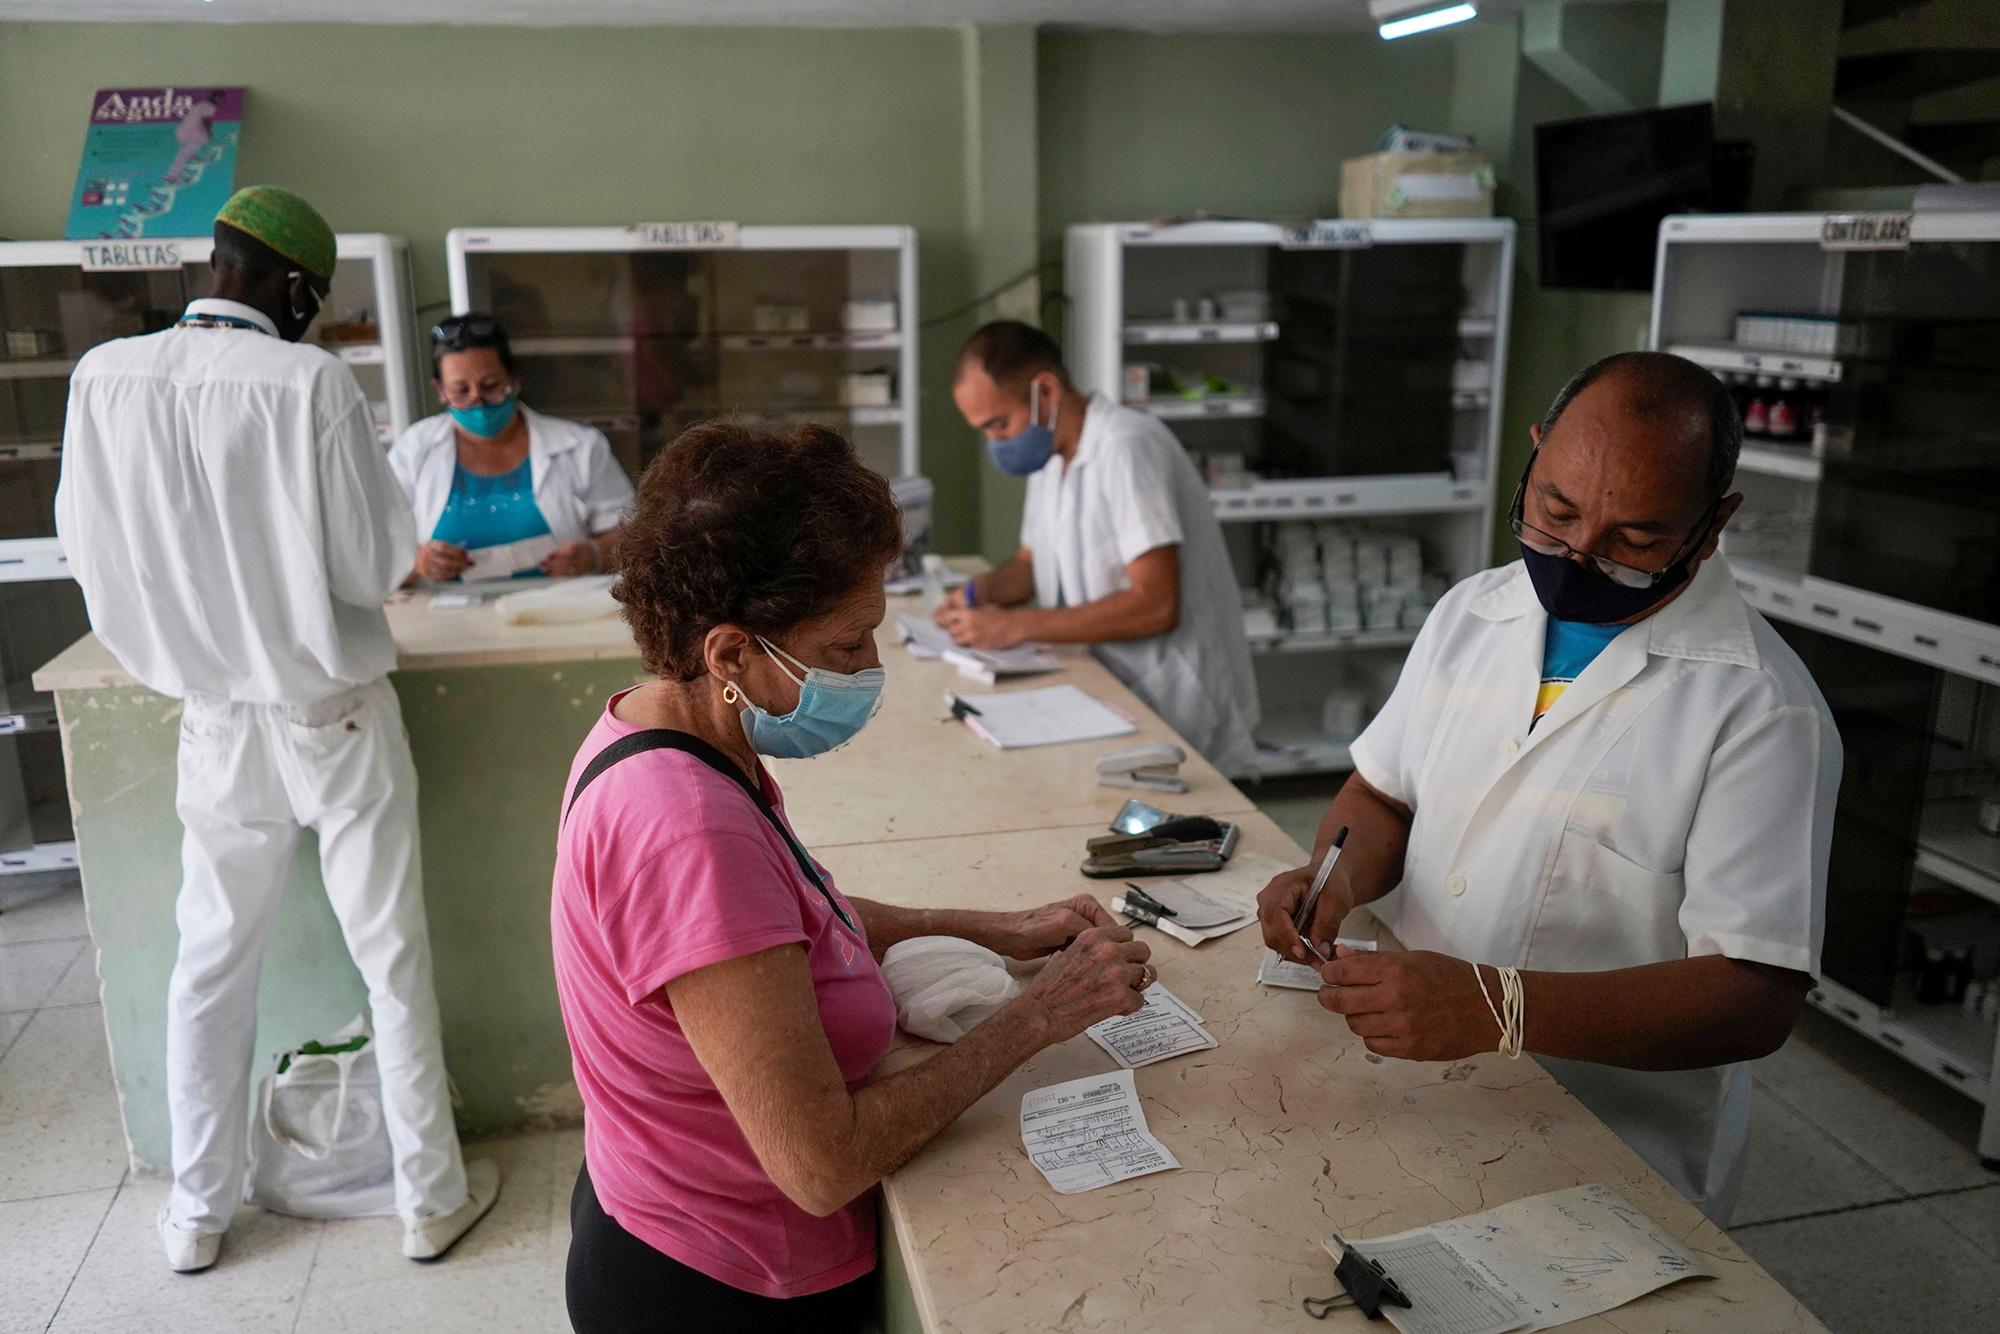 A client buys medicine in a pharmacy in Havana, Cuba, April 9, 2021. Picture taken on April 9, 2021. REUTERS/Alexandre Meneghini